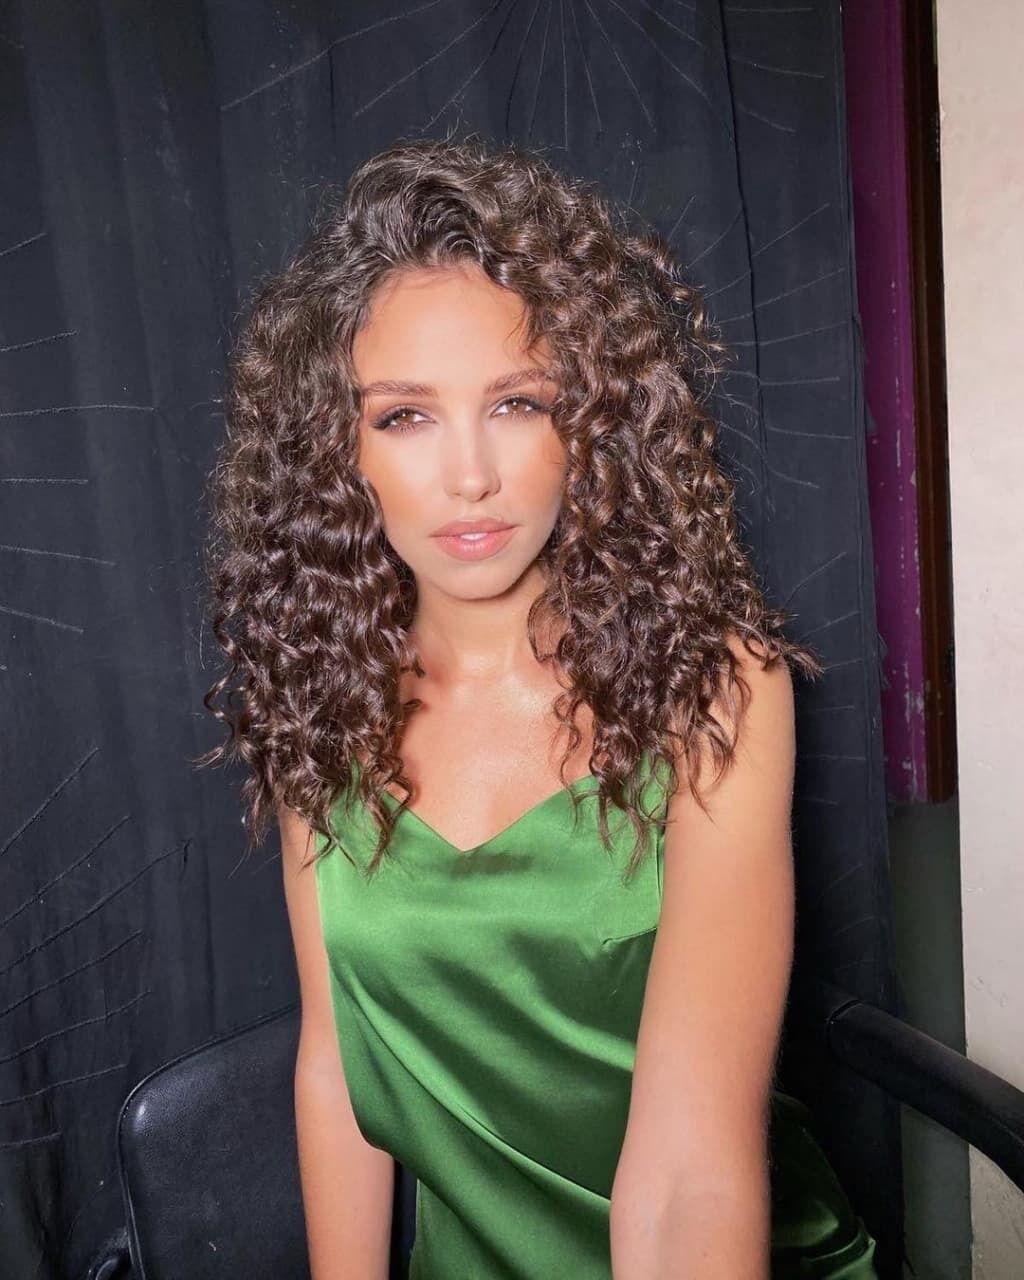 Анна Богдан не шкодує про участь у шоу